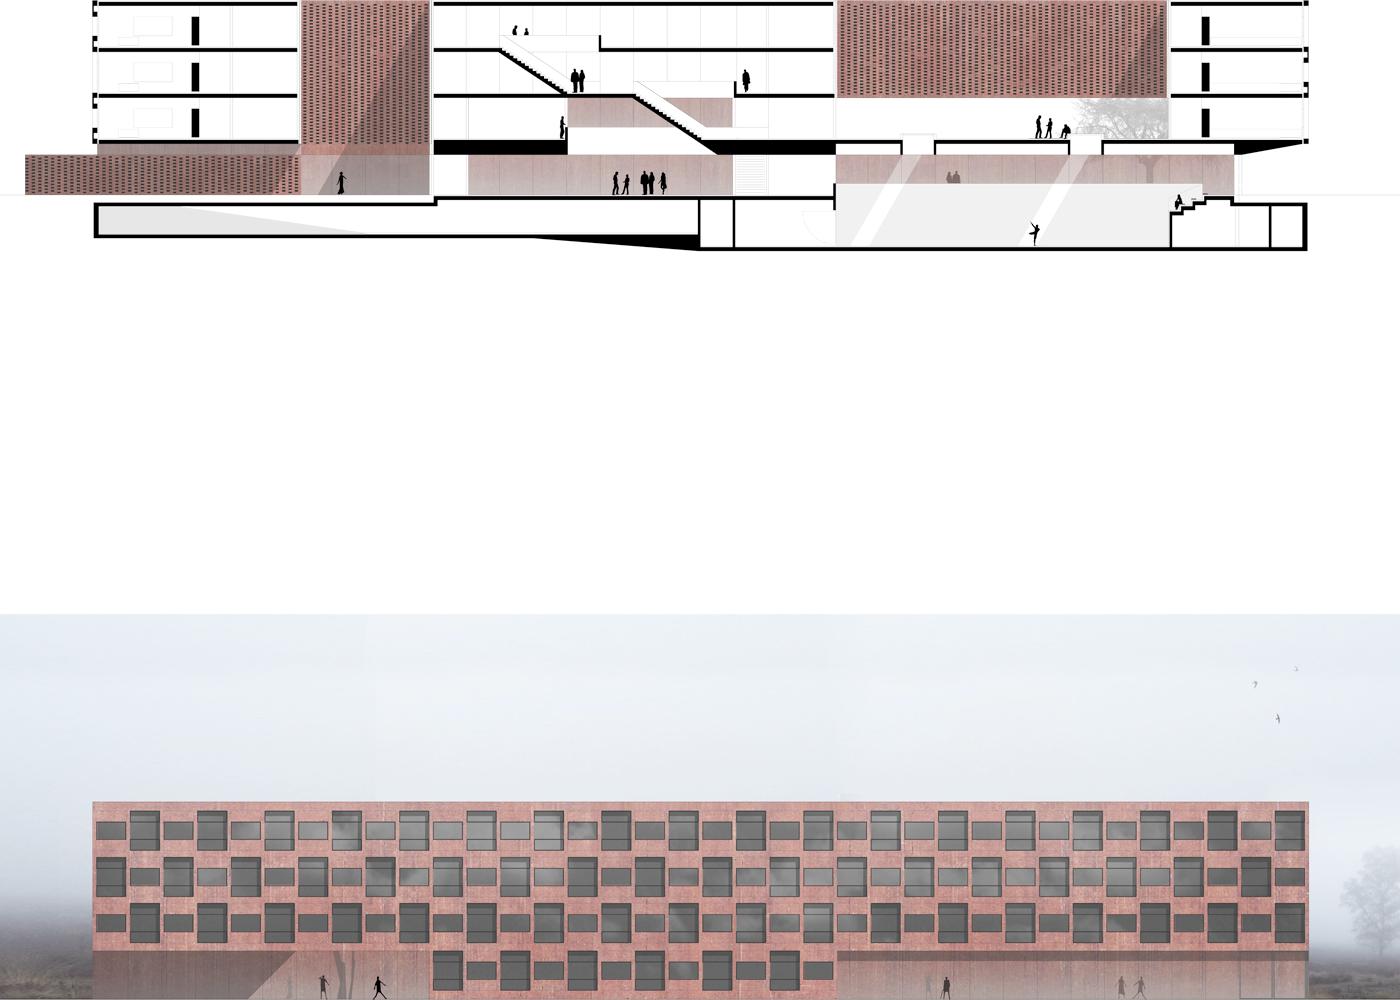 fos bos nordhaide m nchen burger rudacs architekten. Black Bedroom Furniture Sets. Home Design Ideas